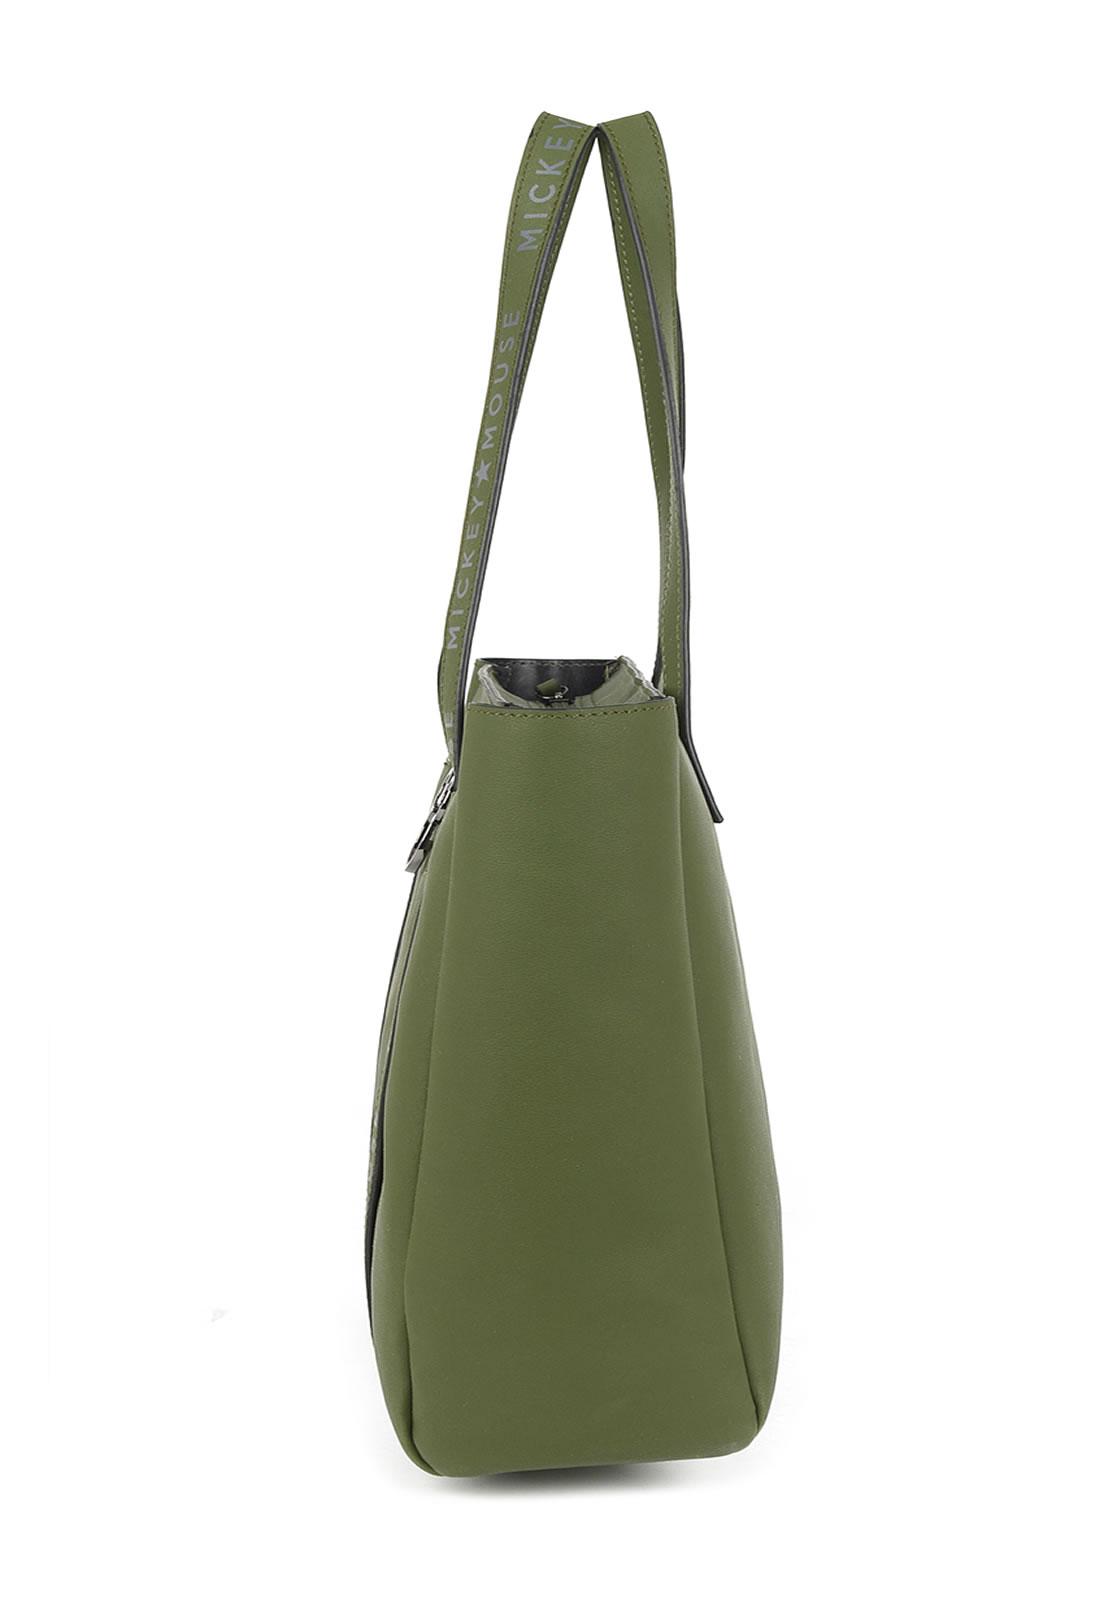 Bolsa Feminina de Ombro Tote Bag Mickey Verde Linda